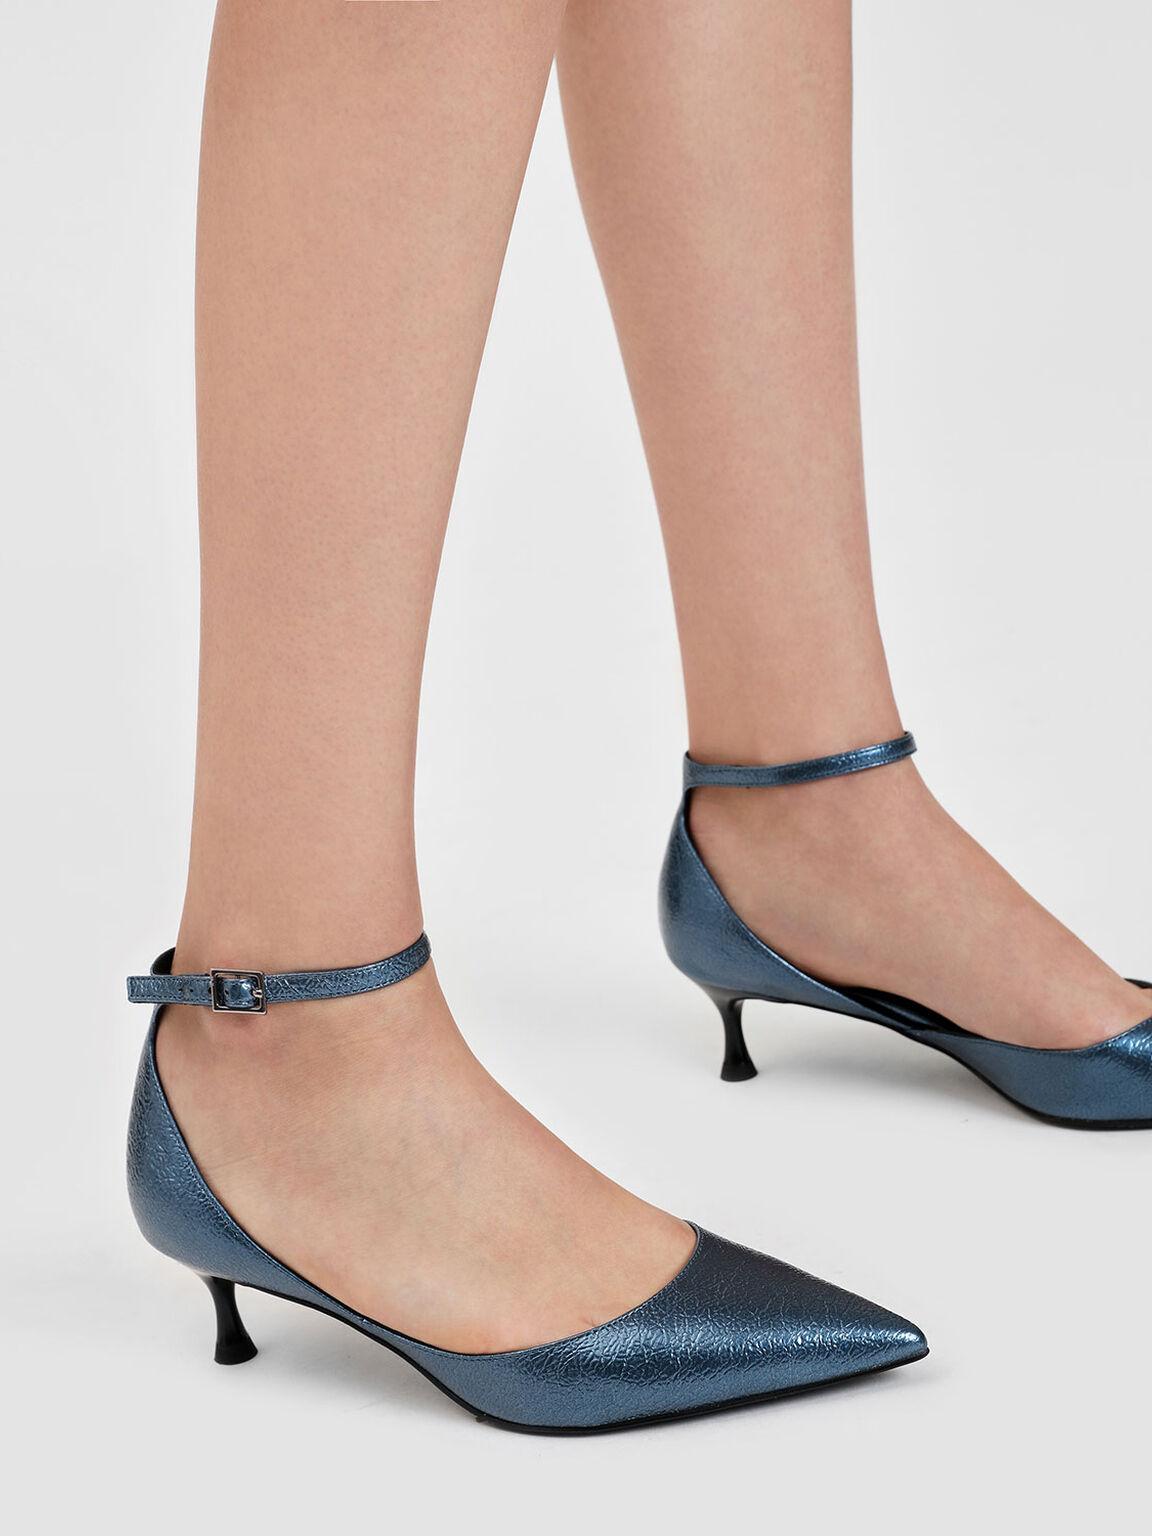 Metallic Ankle Strap Heeled Sandals, Dark Blue, hi-res